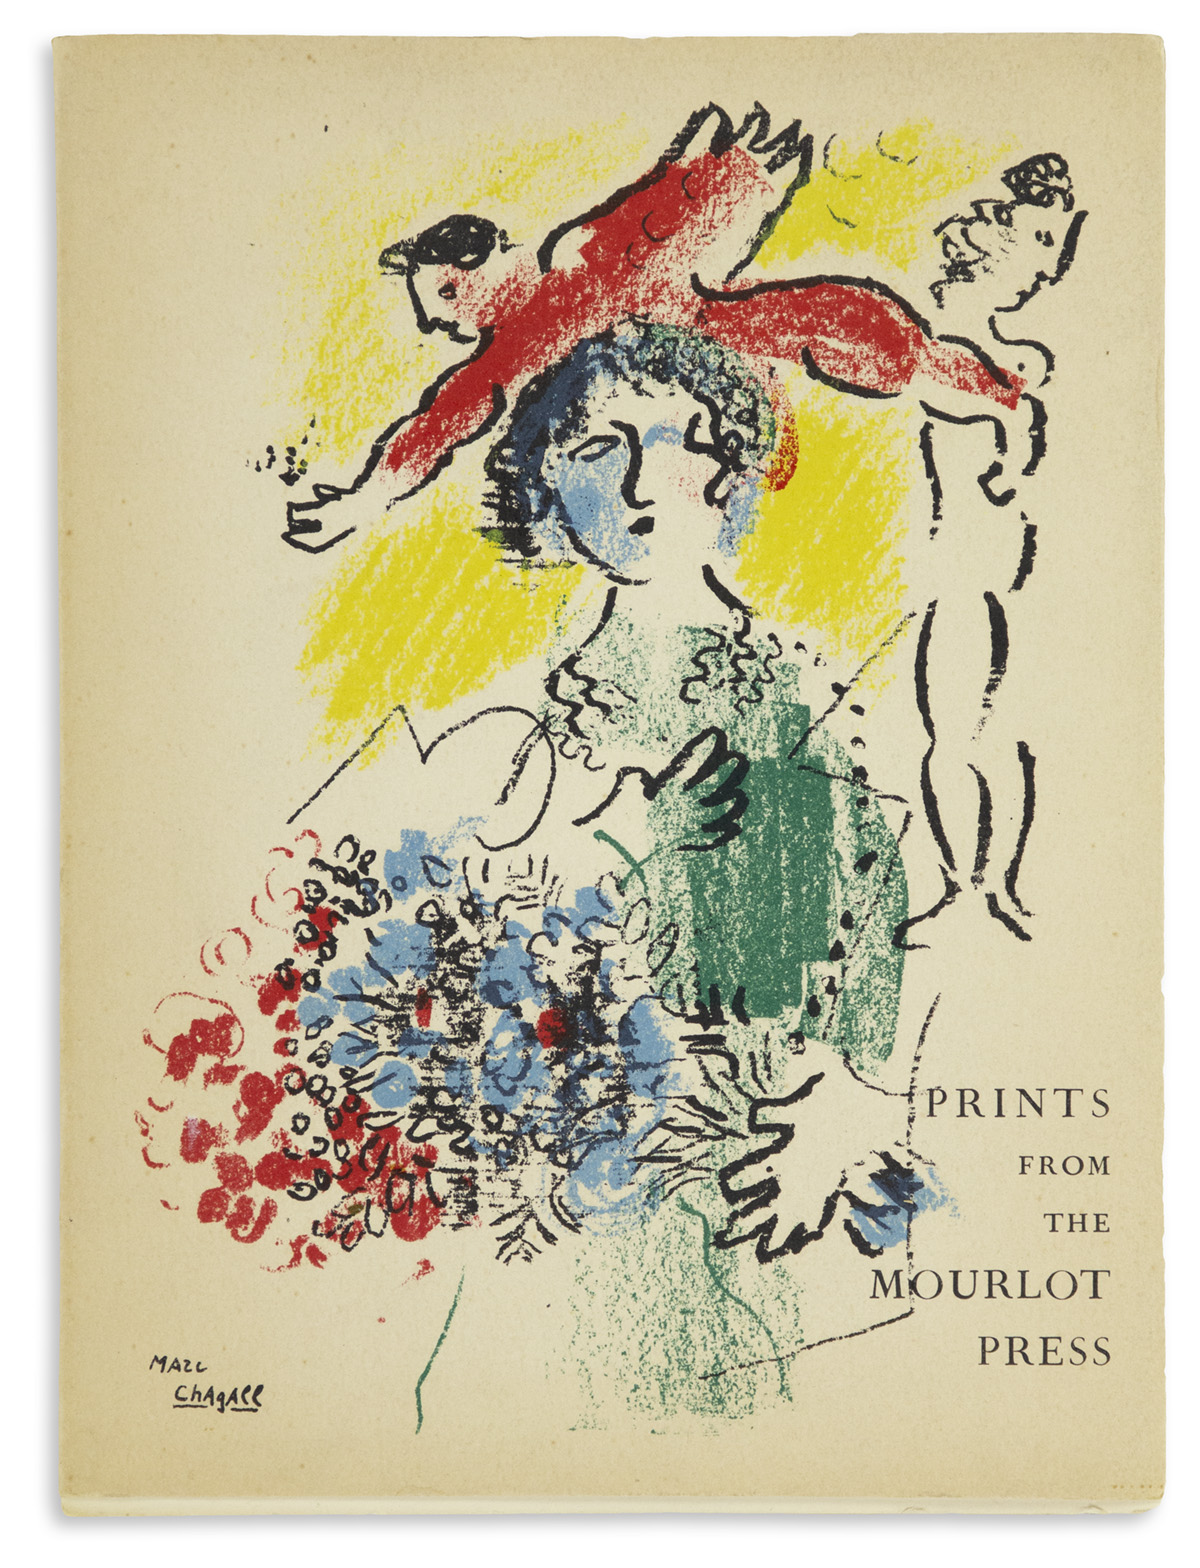 (MOURLOT-PRESS)-Prints-from-the-Mourlot-Press